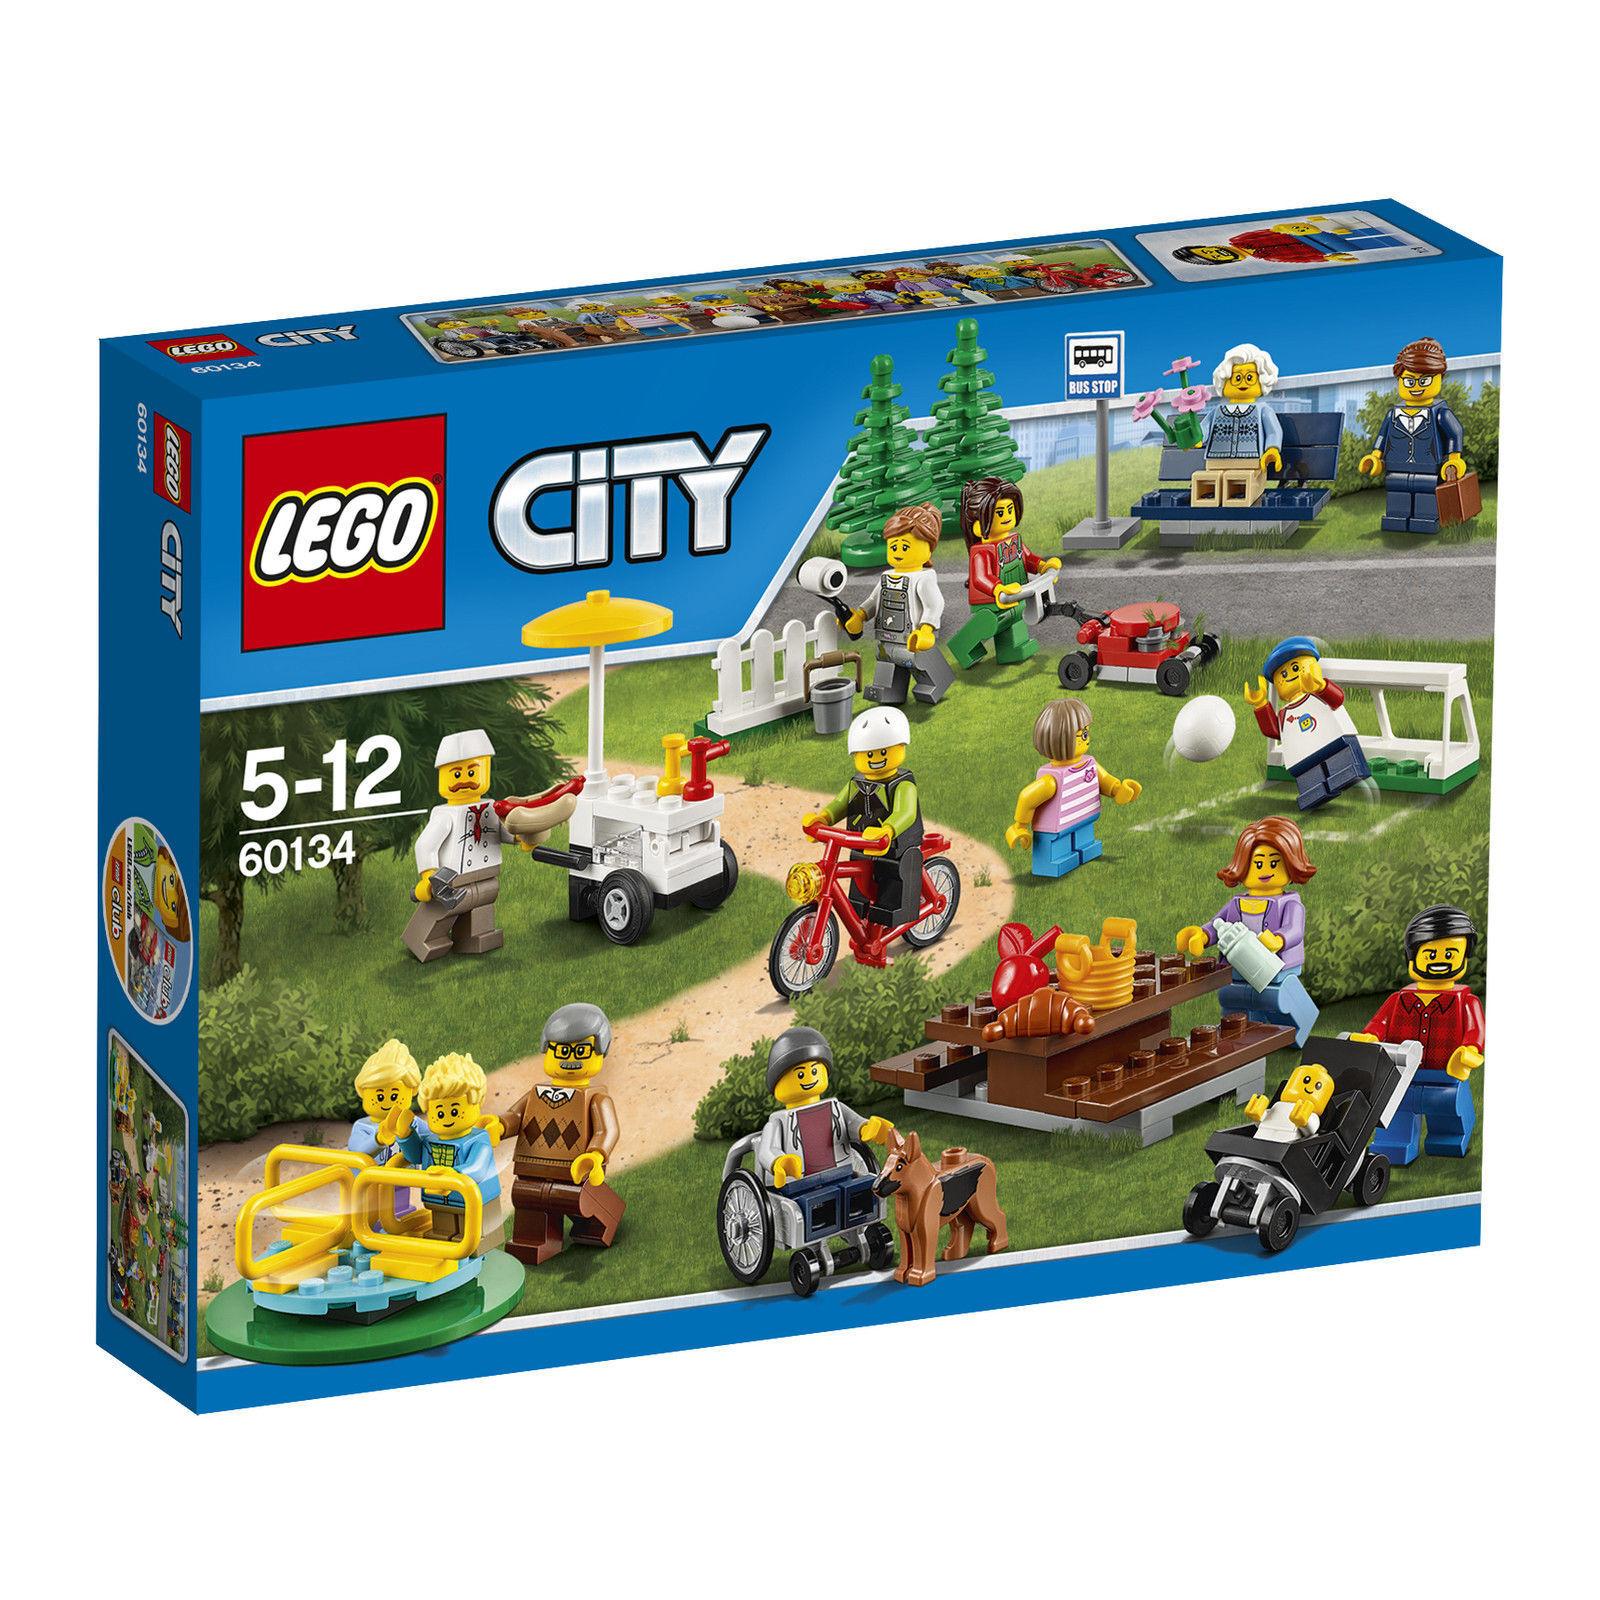 LEGO City Stadtbewohner (60134) -NEU- Minifiguren